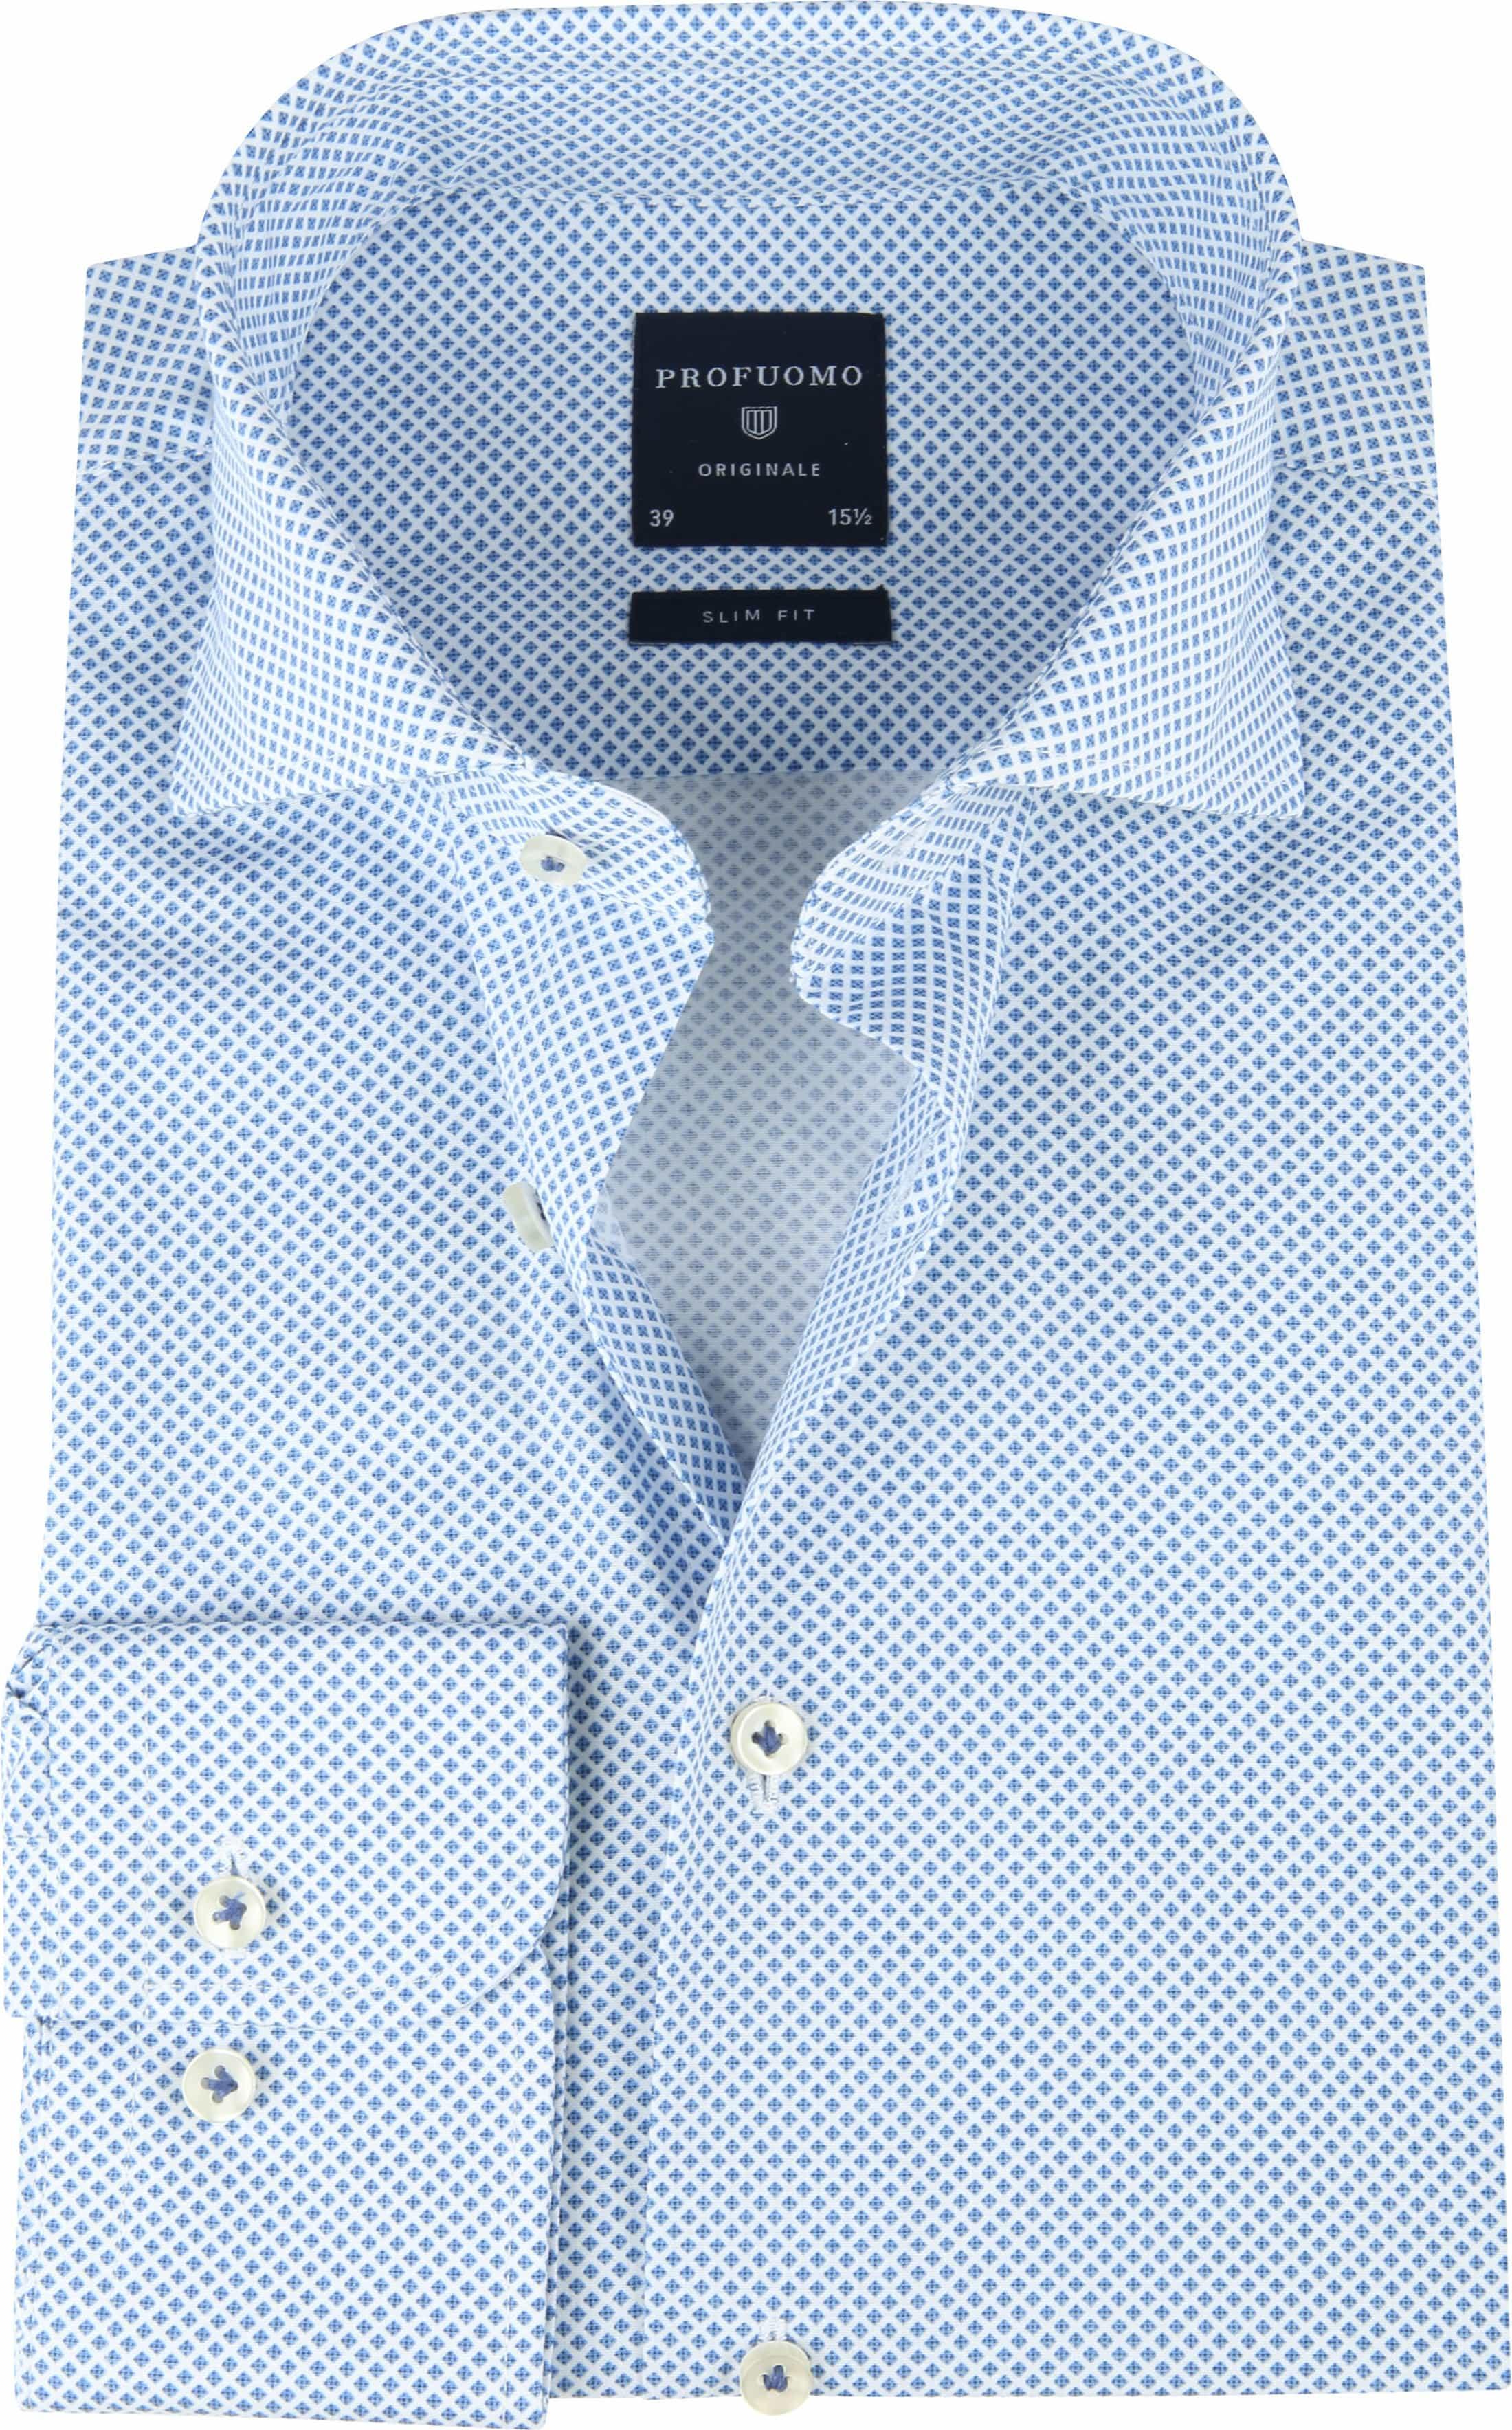 Profuomo SF Shirt Pane Blue foto 0